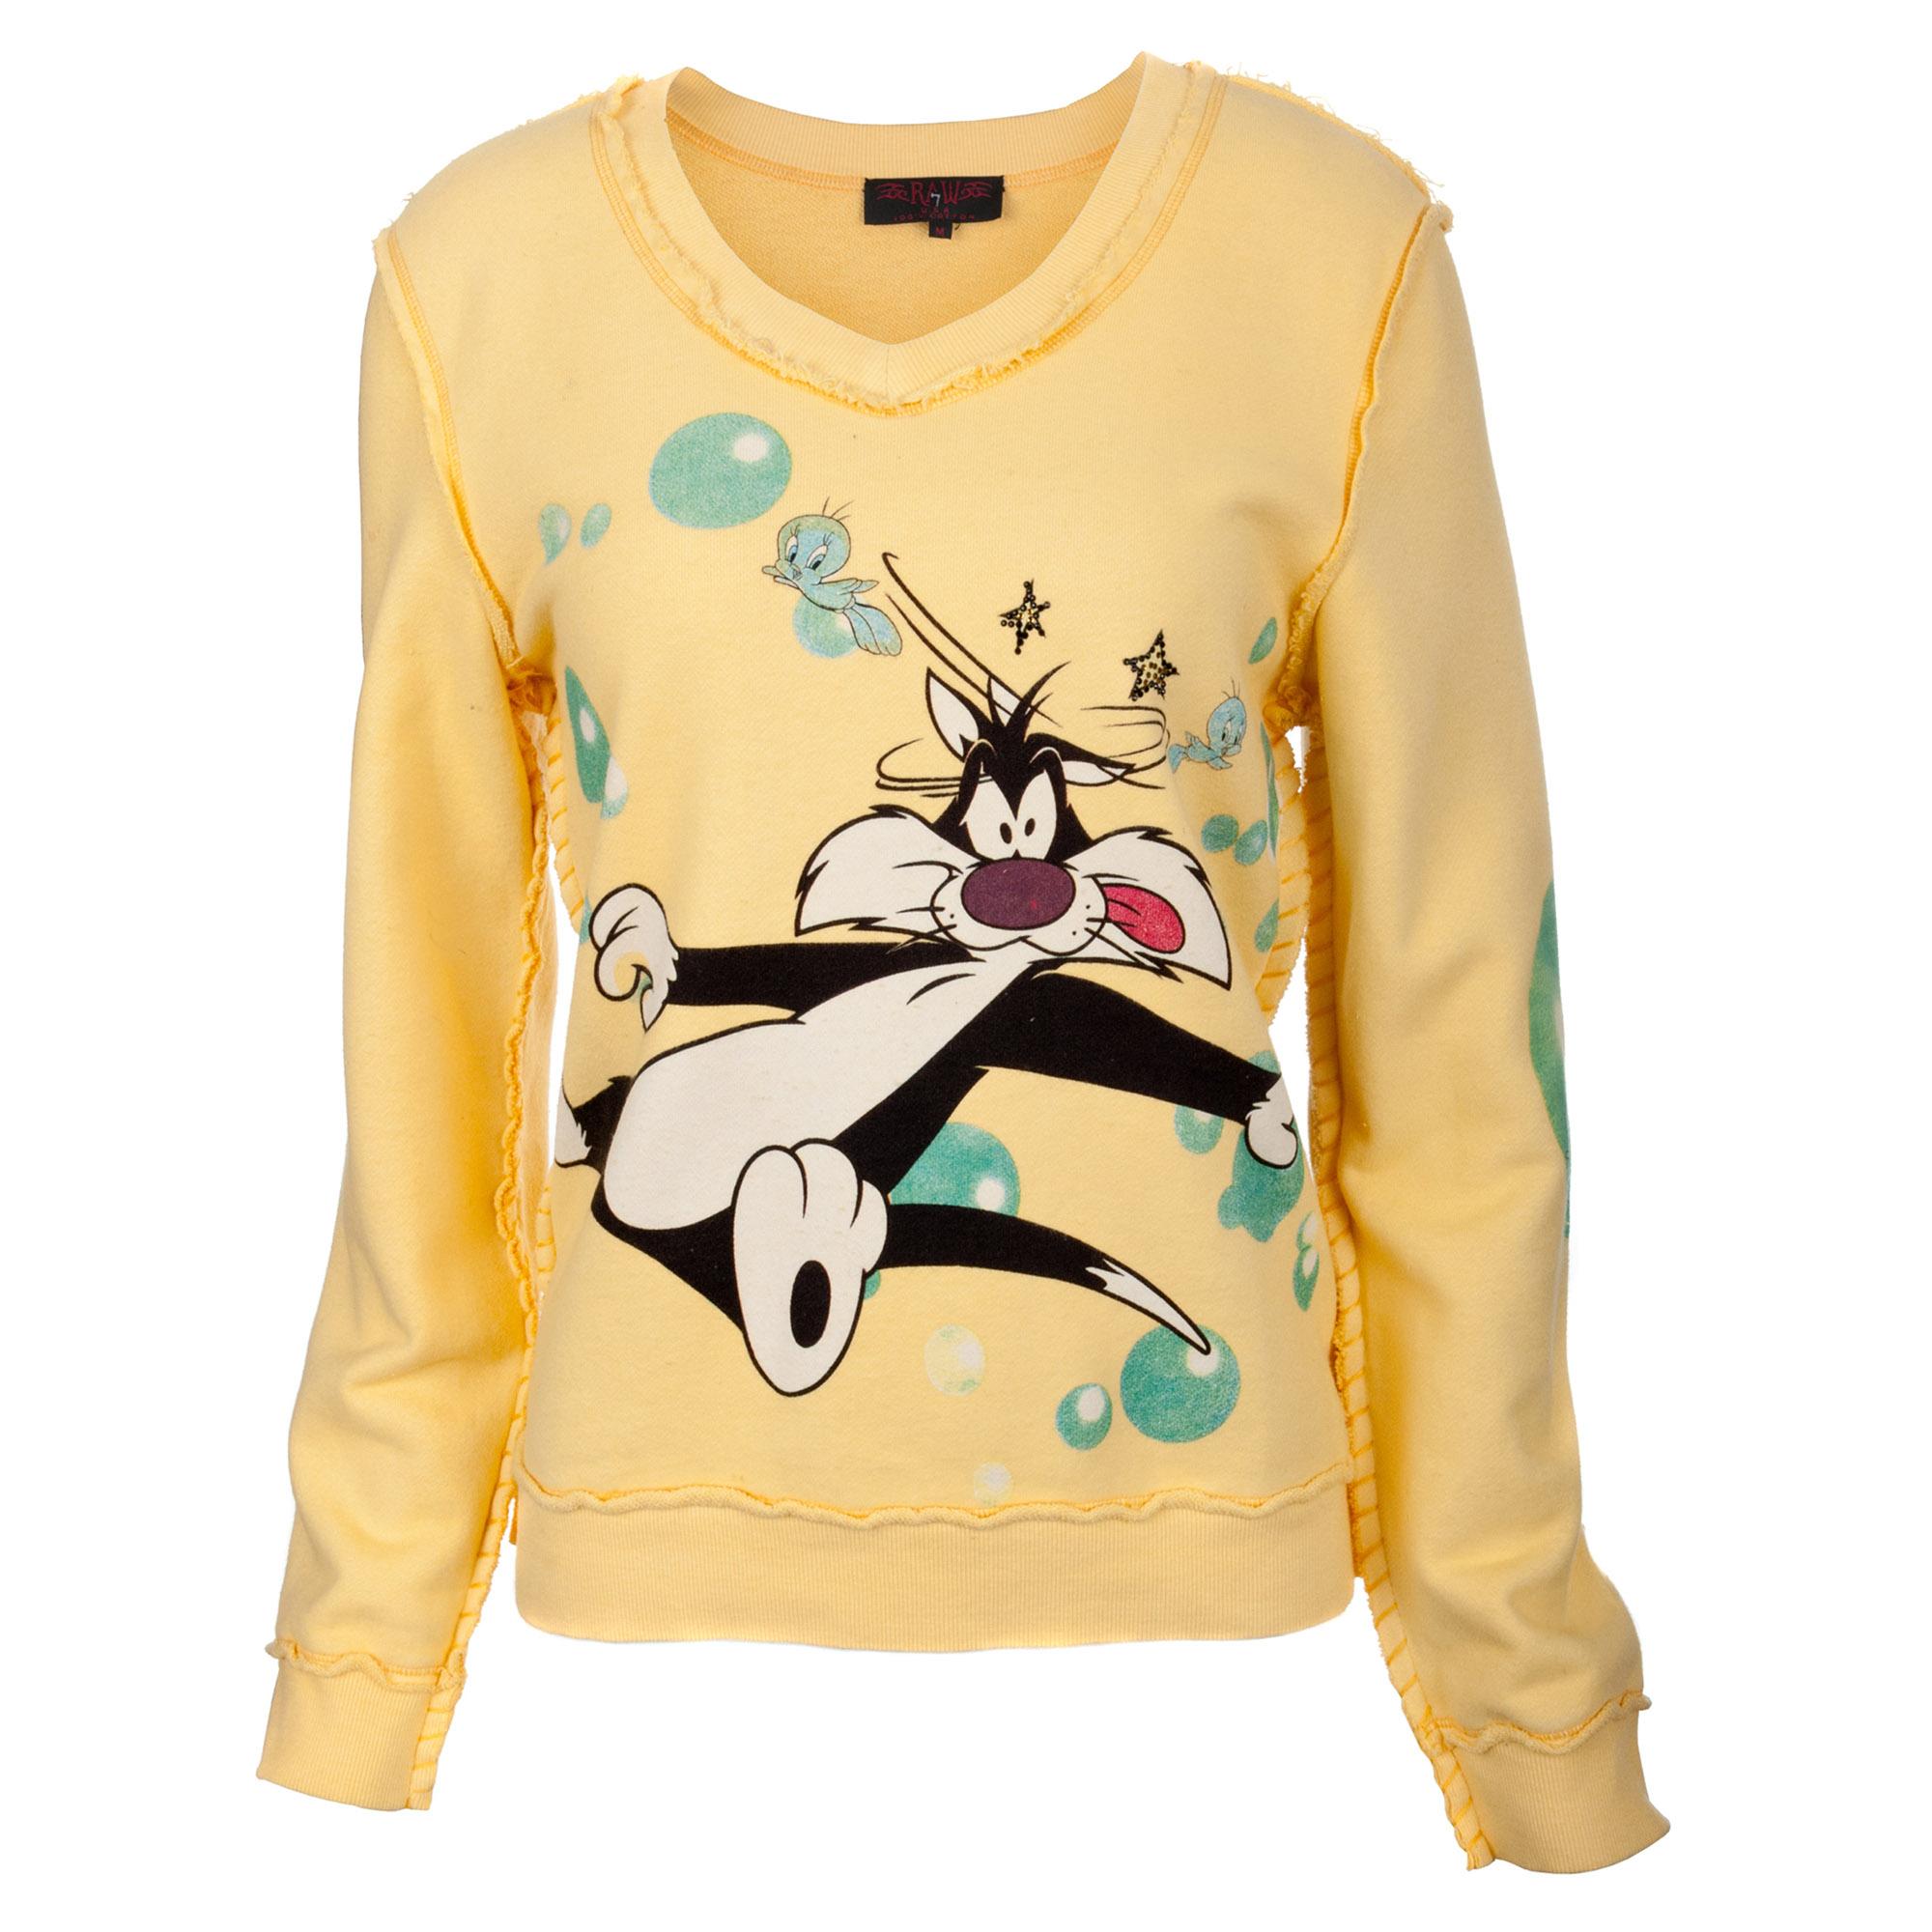 RAW 7 ST72- Syl Looney Tunes Women's Yellow Sweatshirt Sylvester & Tweet Graphic